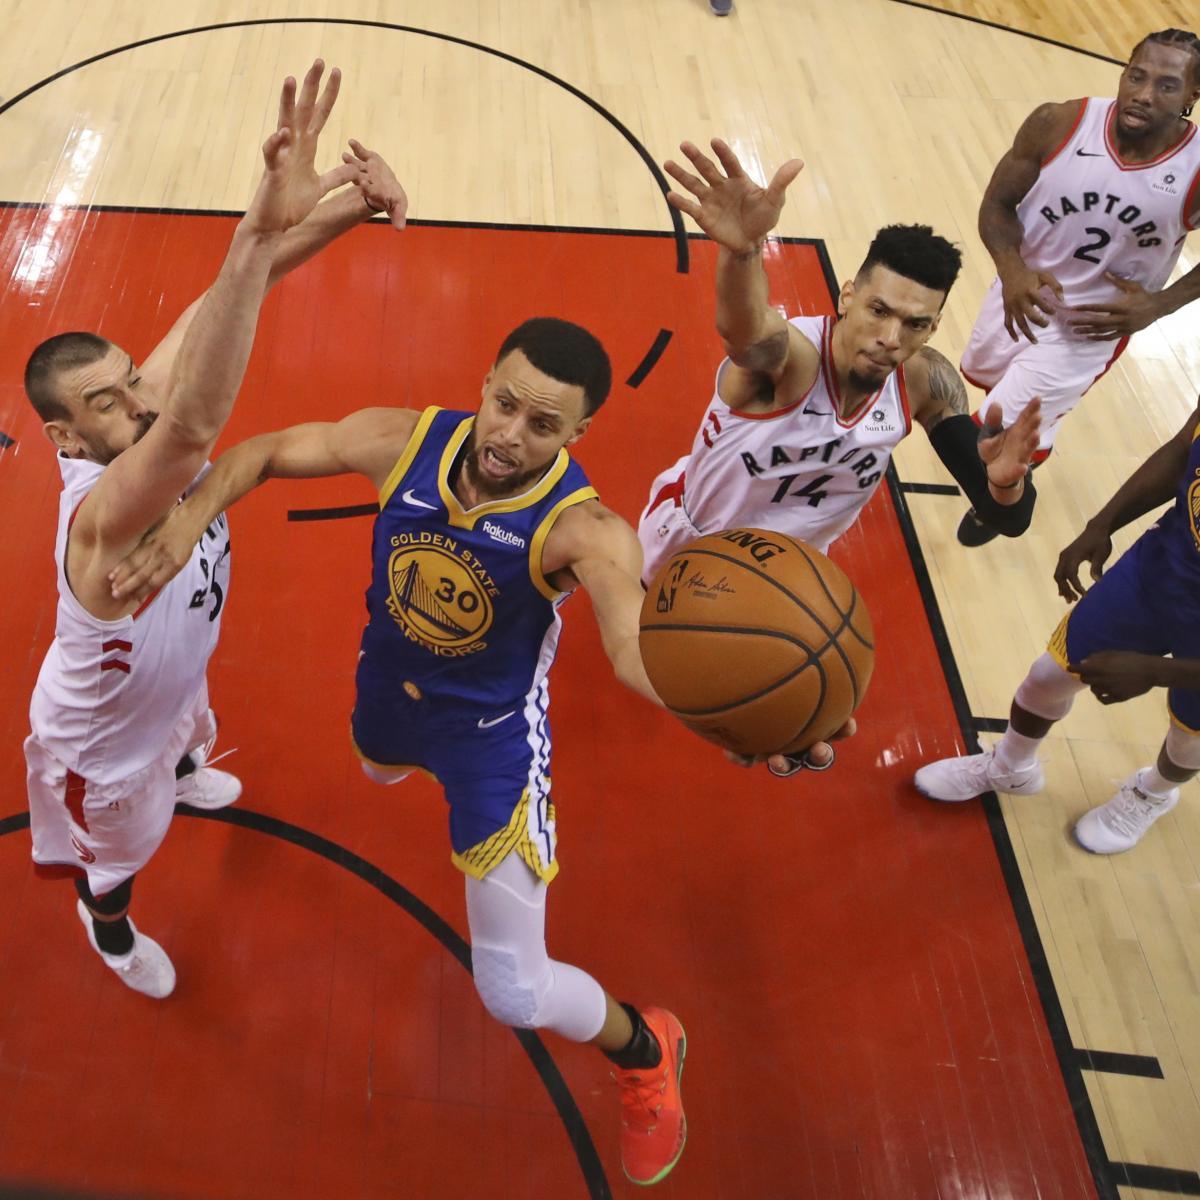 NBA Finals 2019: Updated Championship Odds, TV Schedule